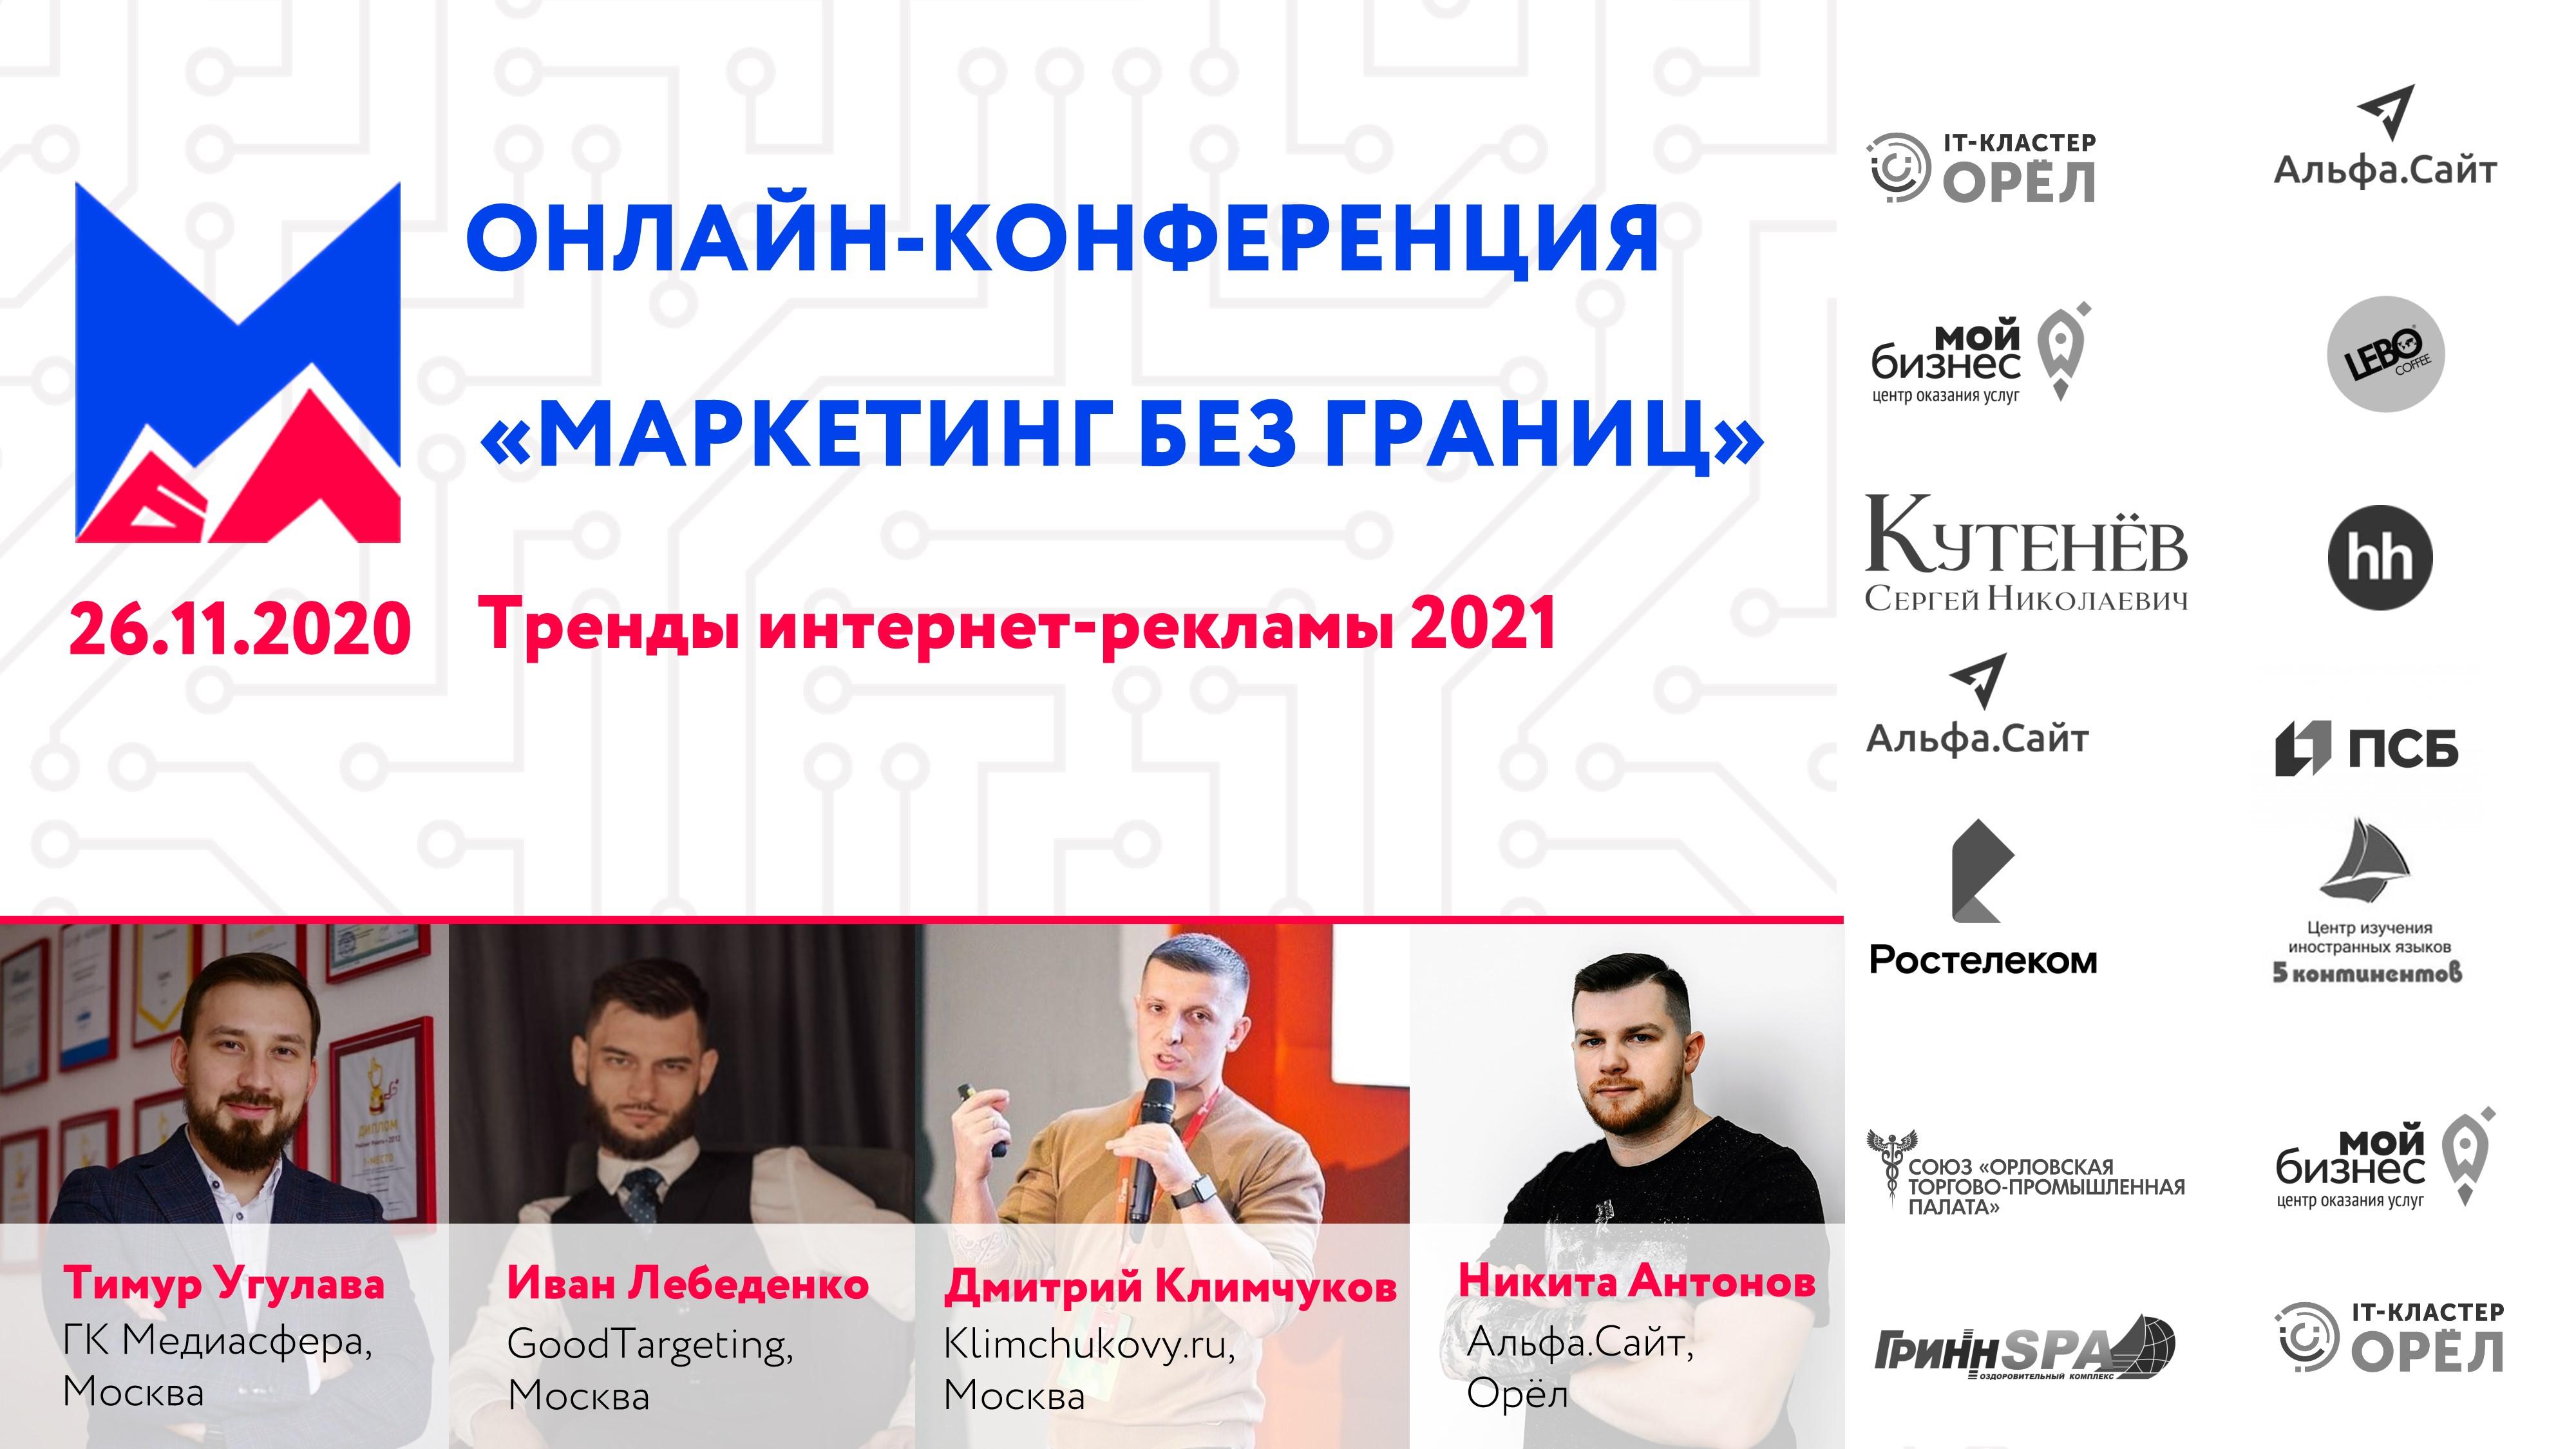 Конференция «Маркетинг без границ: тренды интернет-рекламы»